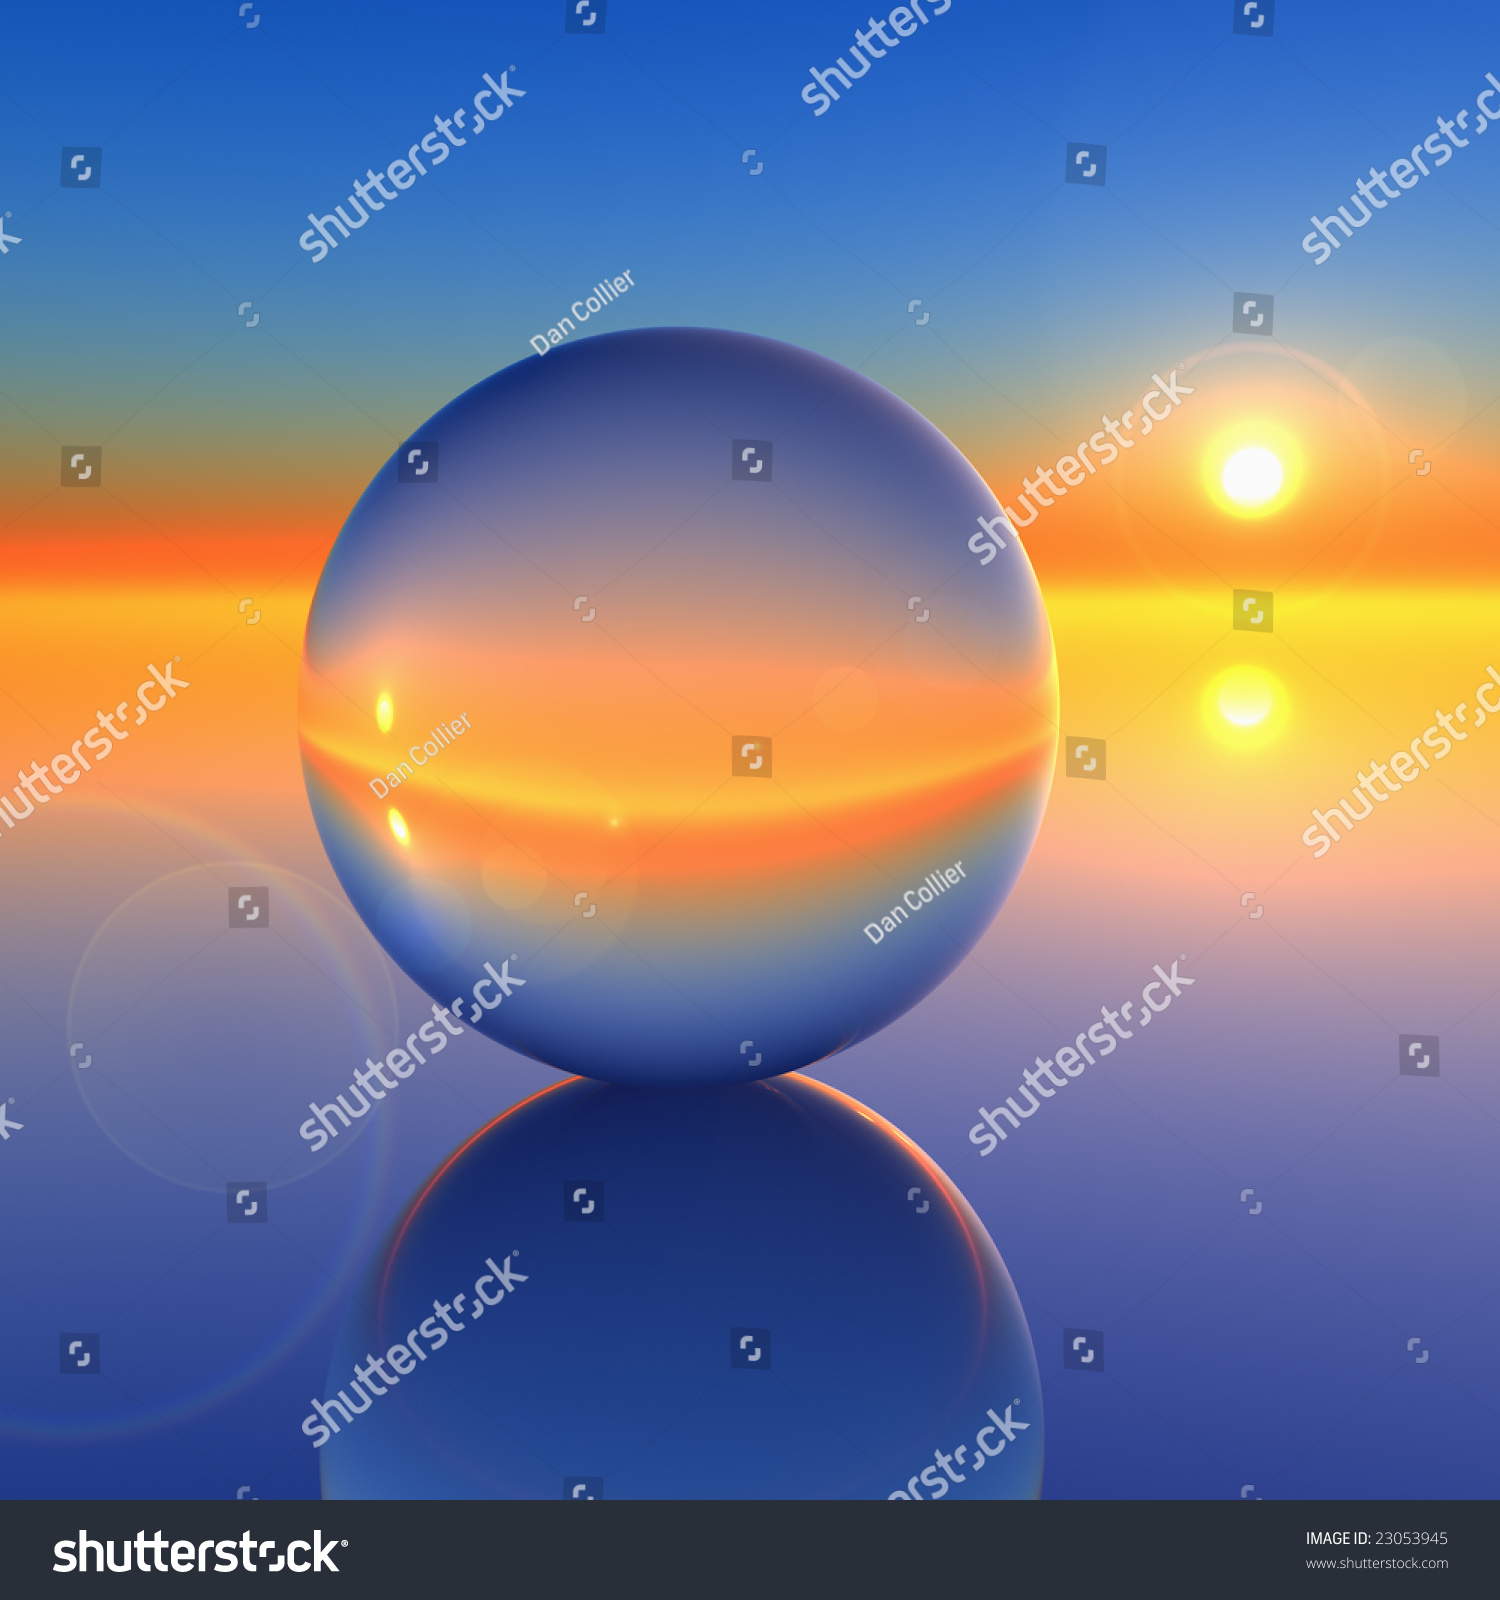 eebdce9a59 ... Future Ball  Abstract Crystal Ball On Future Horizon Stock Photo